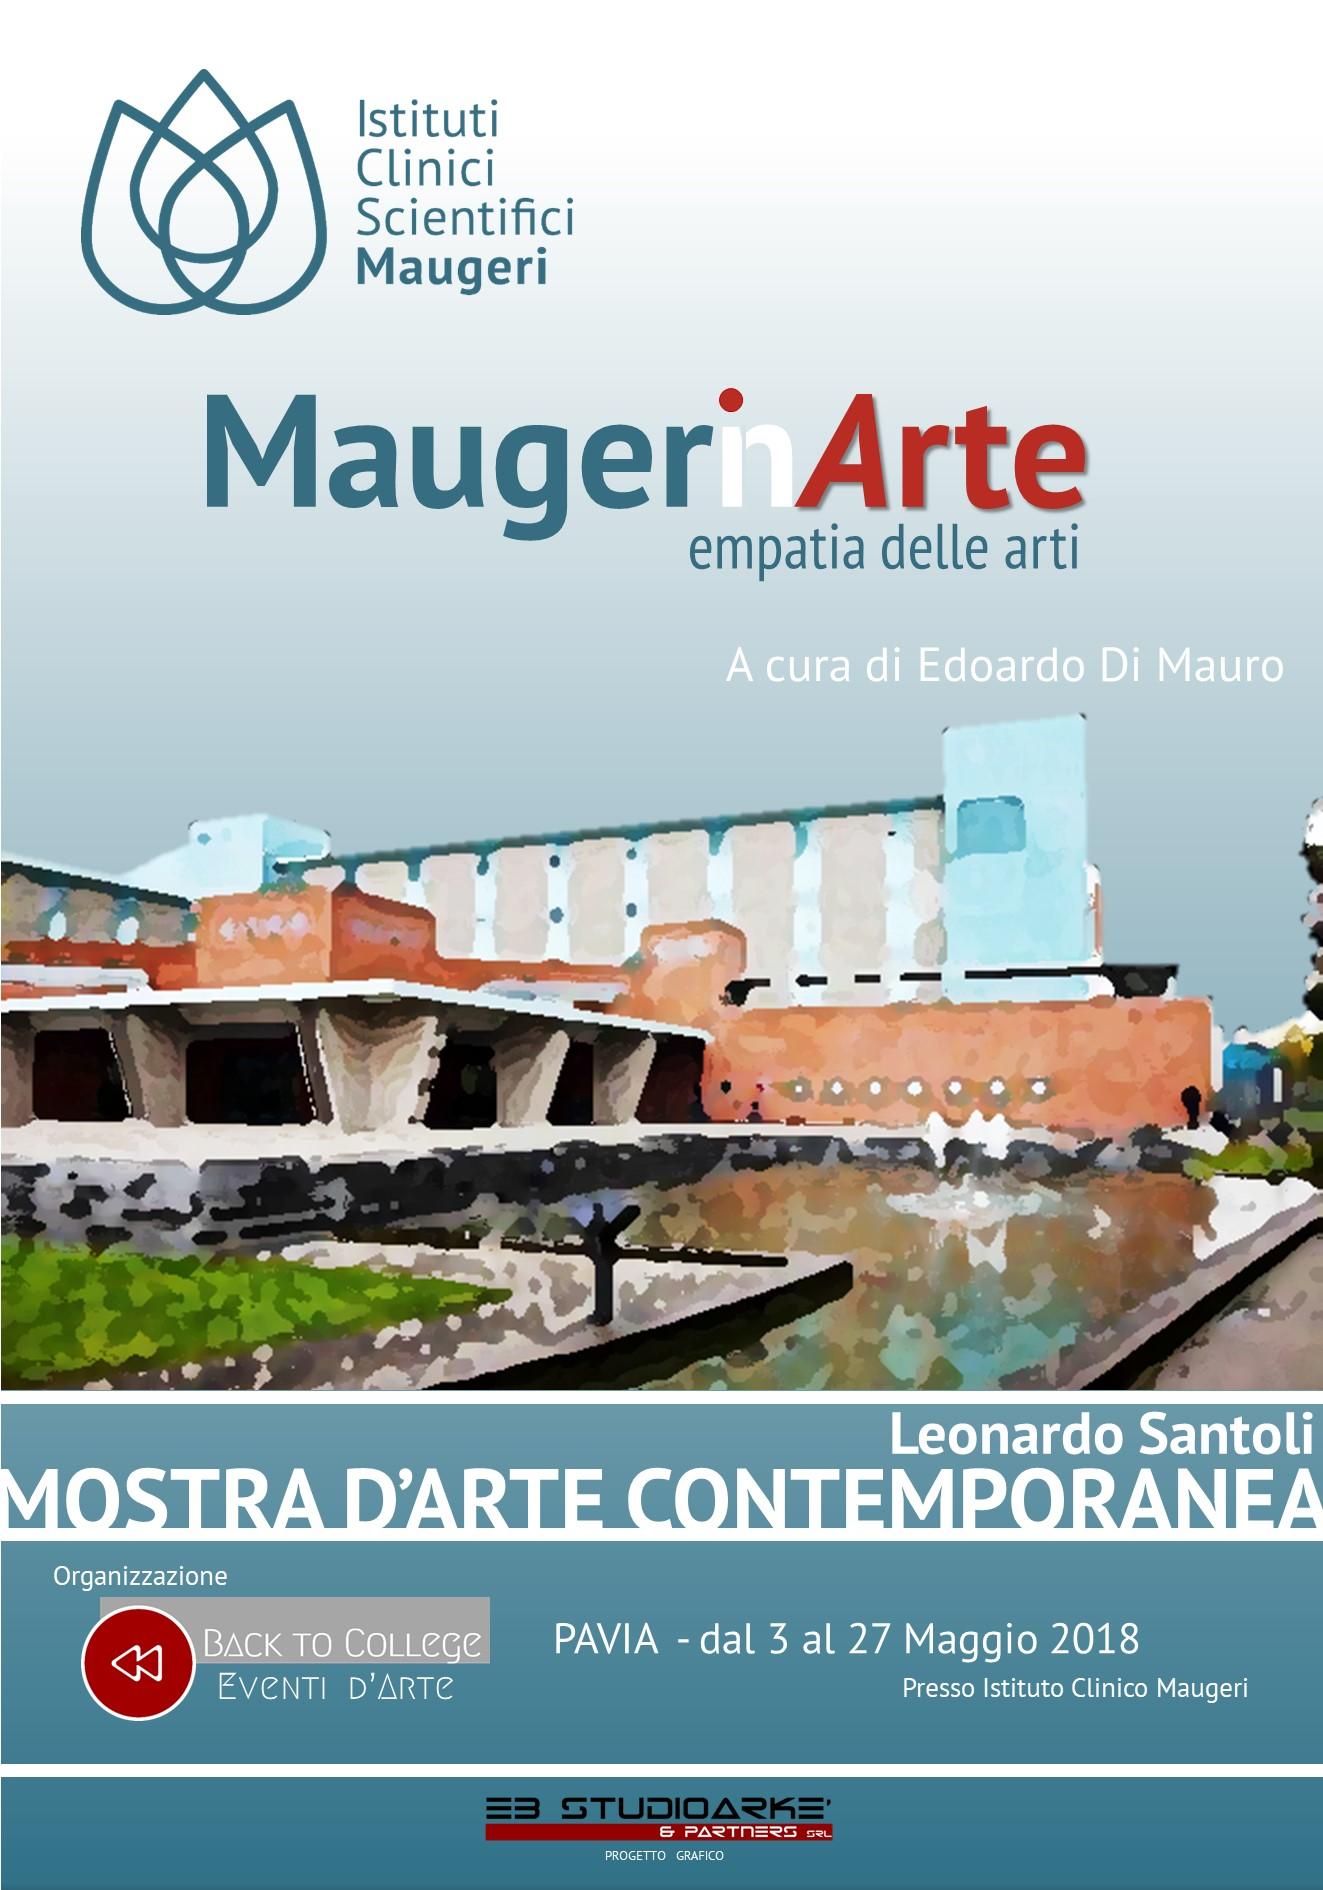 MAUGERI IN ARTE – Mostra d'arte contemporanea